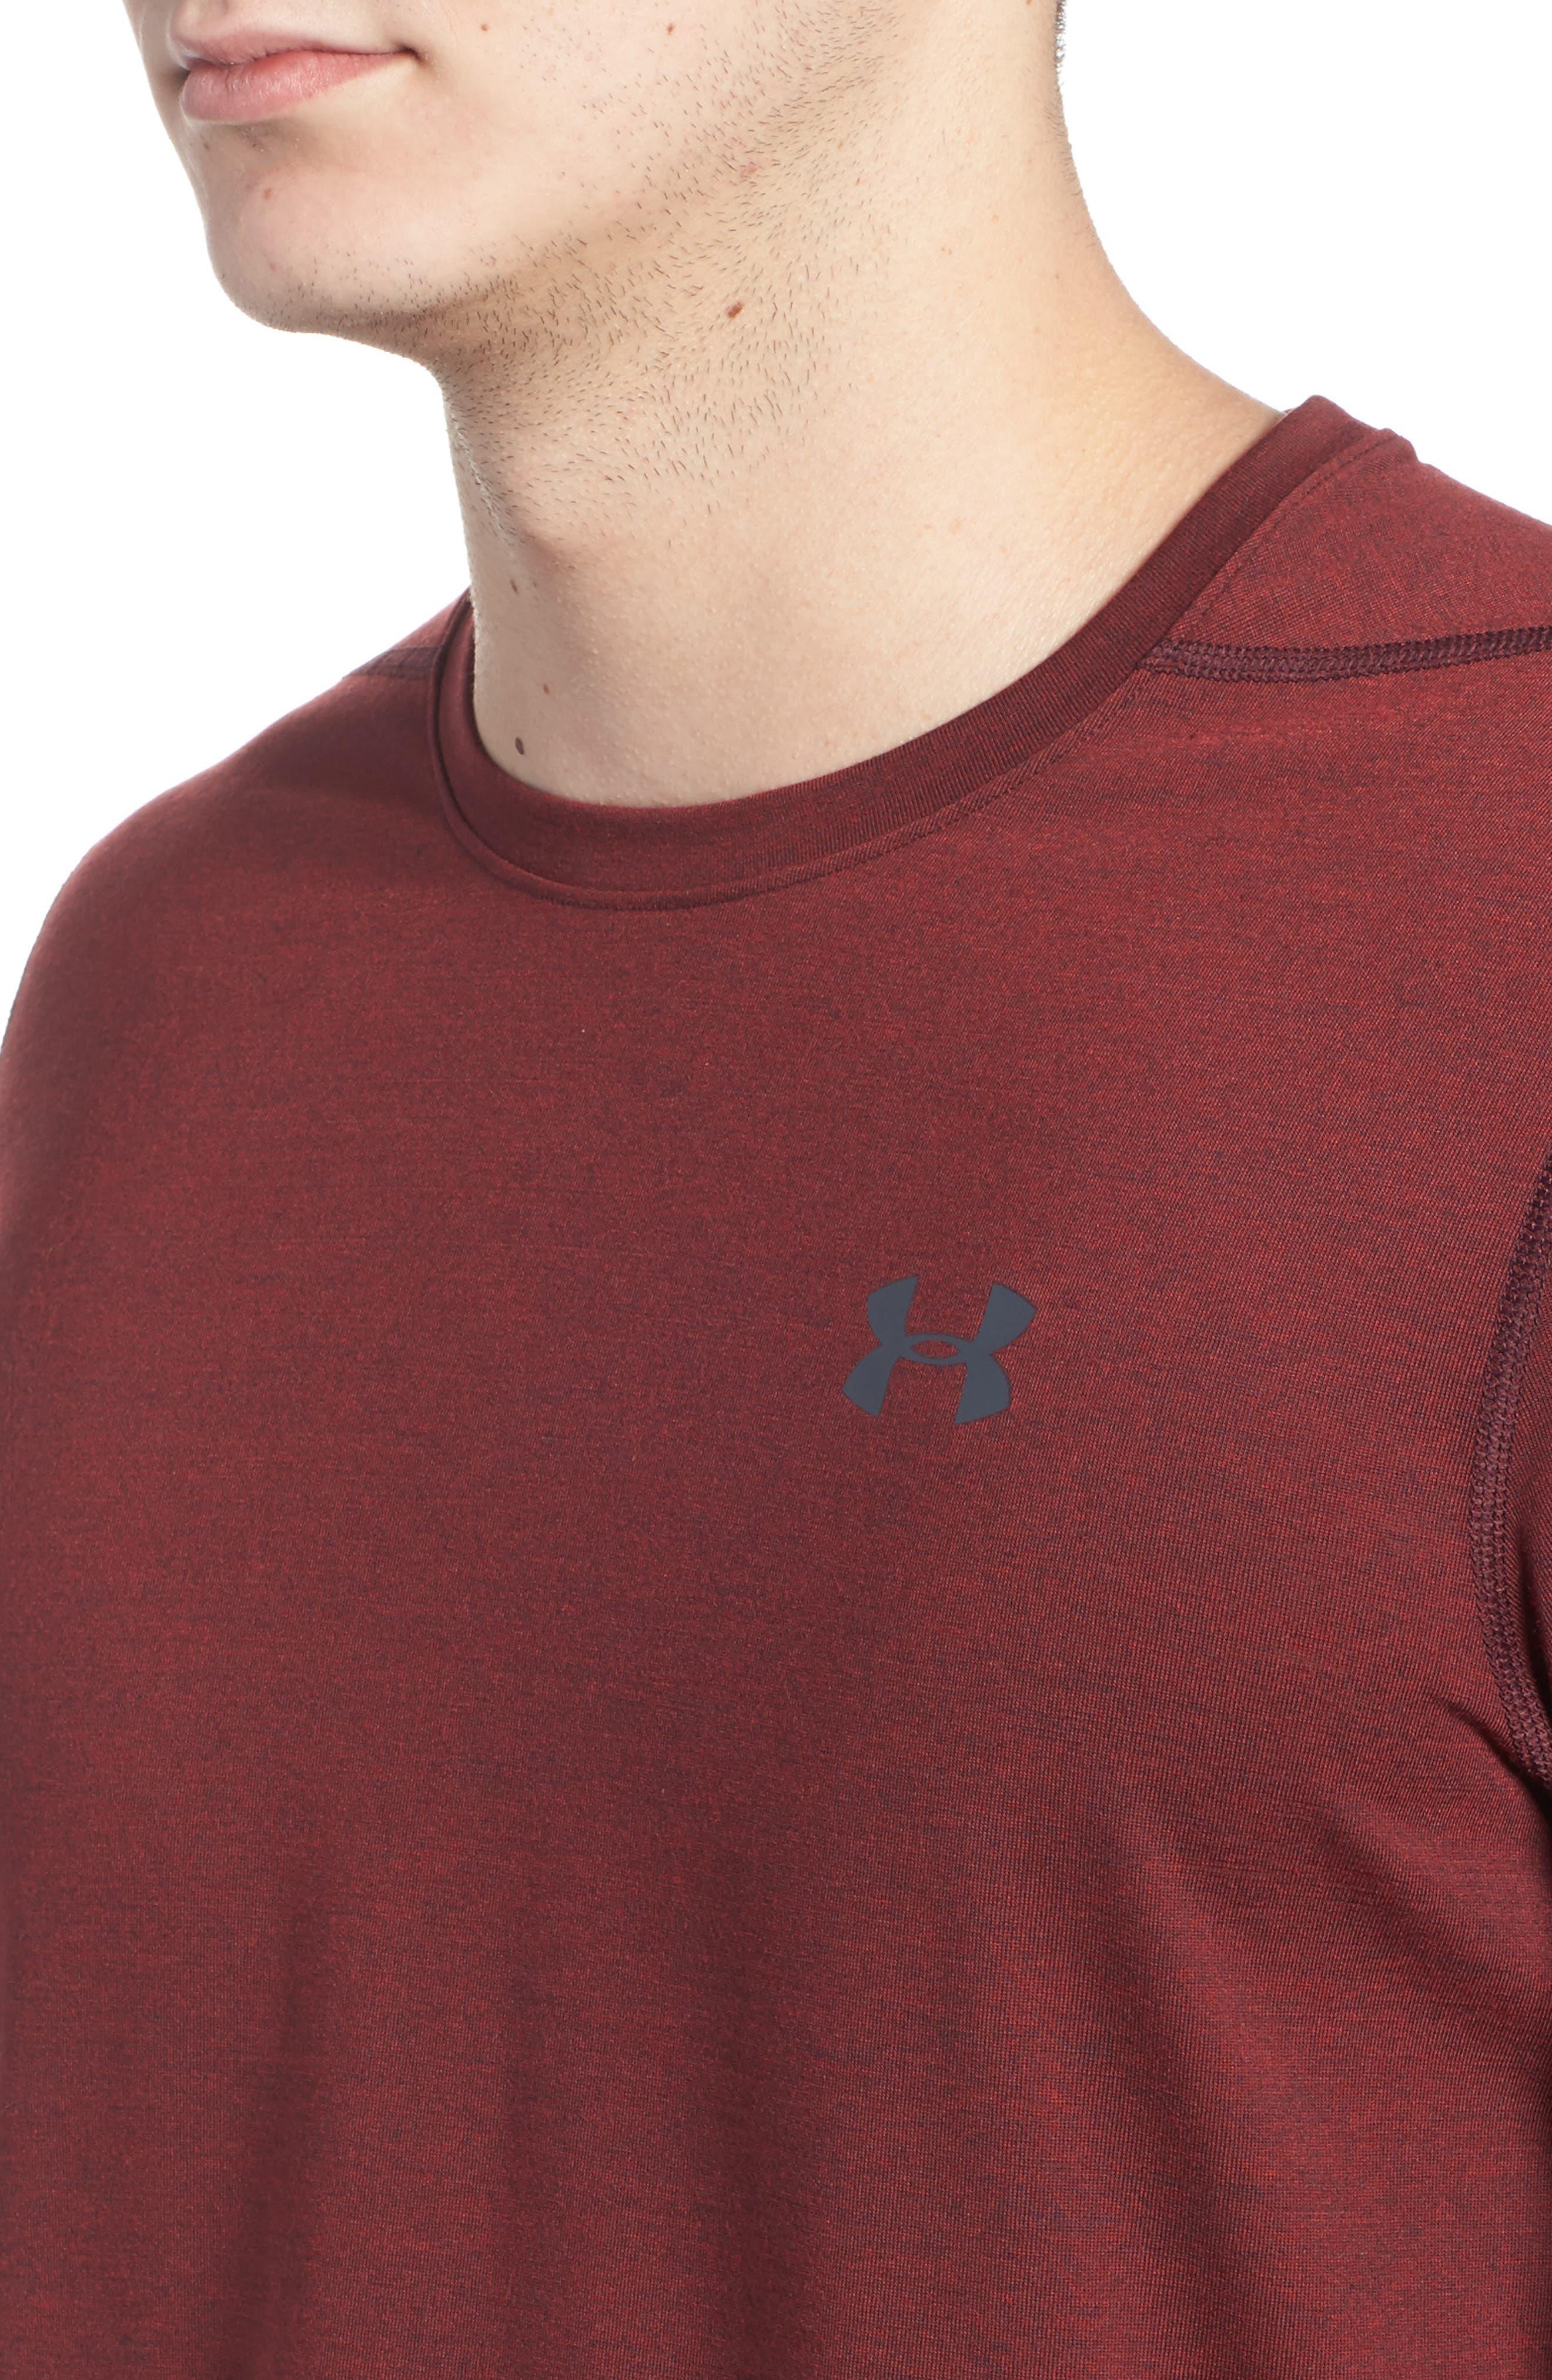 Alternate Image 4  - Under Armour Threadborne Siro 3C Twist T-Shirt